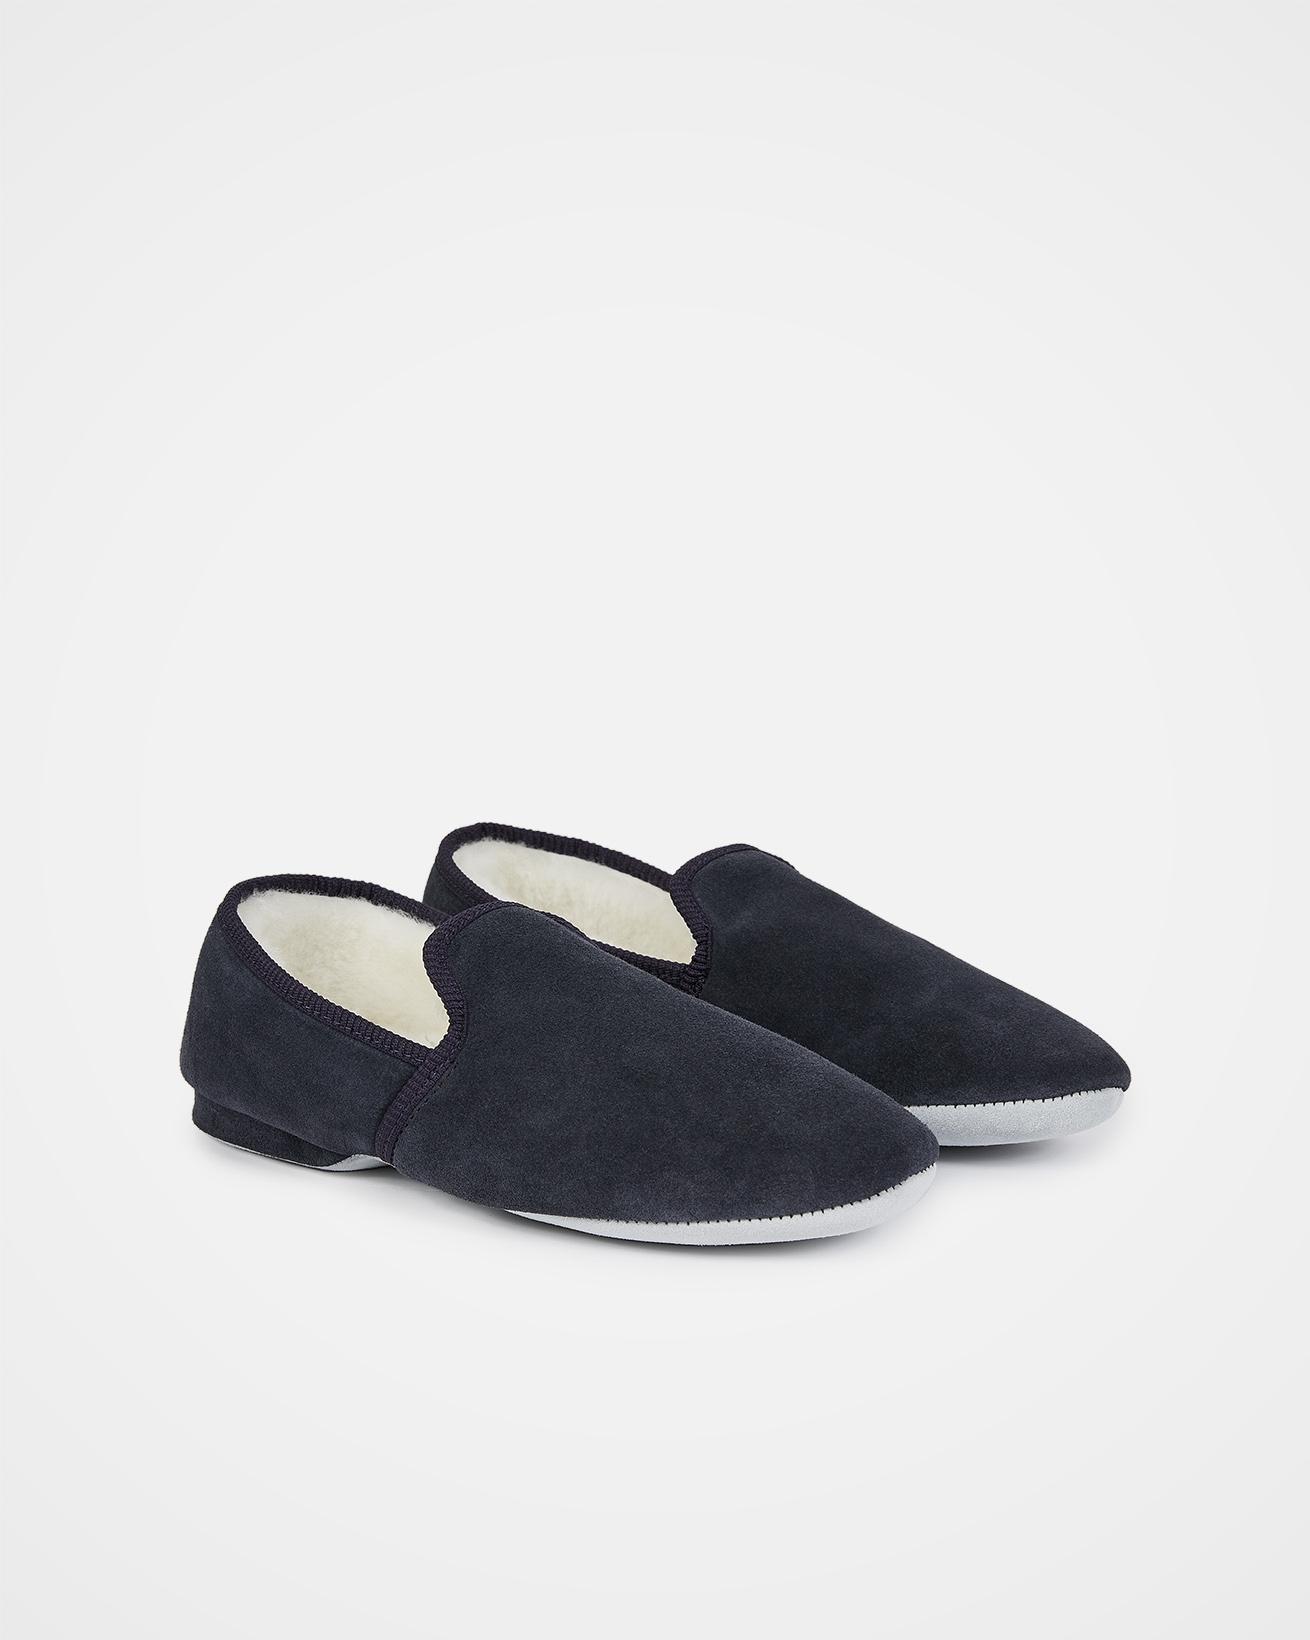 2130_windsor-slippers_navy_pair_web.jpg